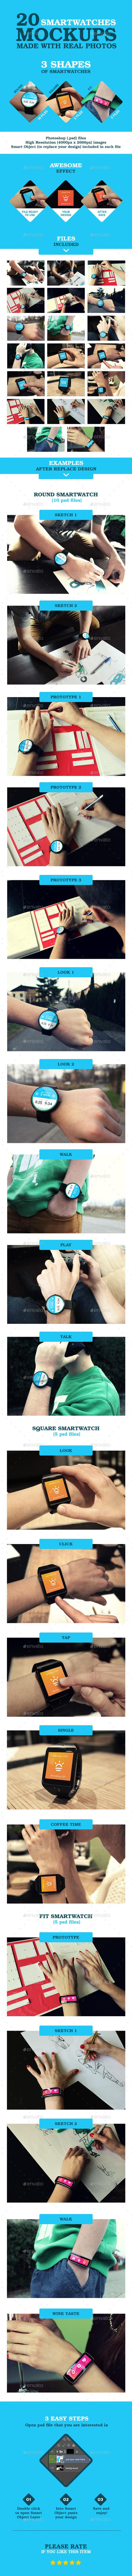 Smart Watch Mockups - 20 Real Photos Mockups - Displays Product Mock-Ups